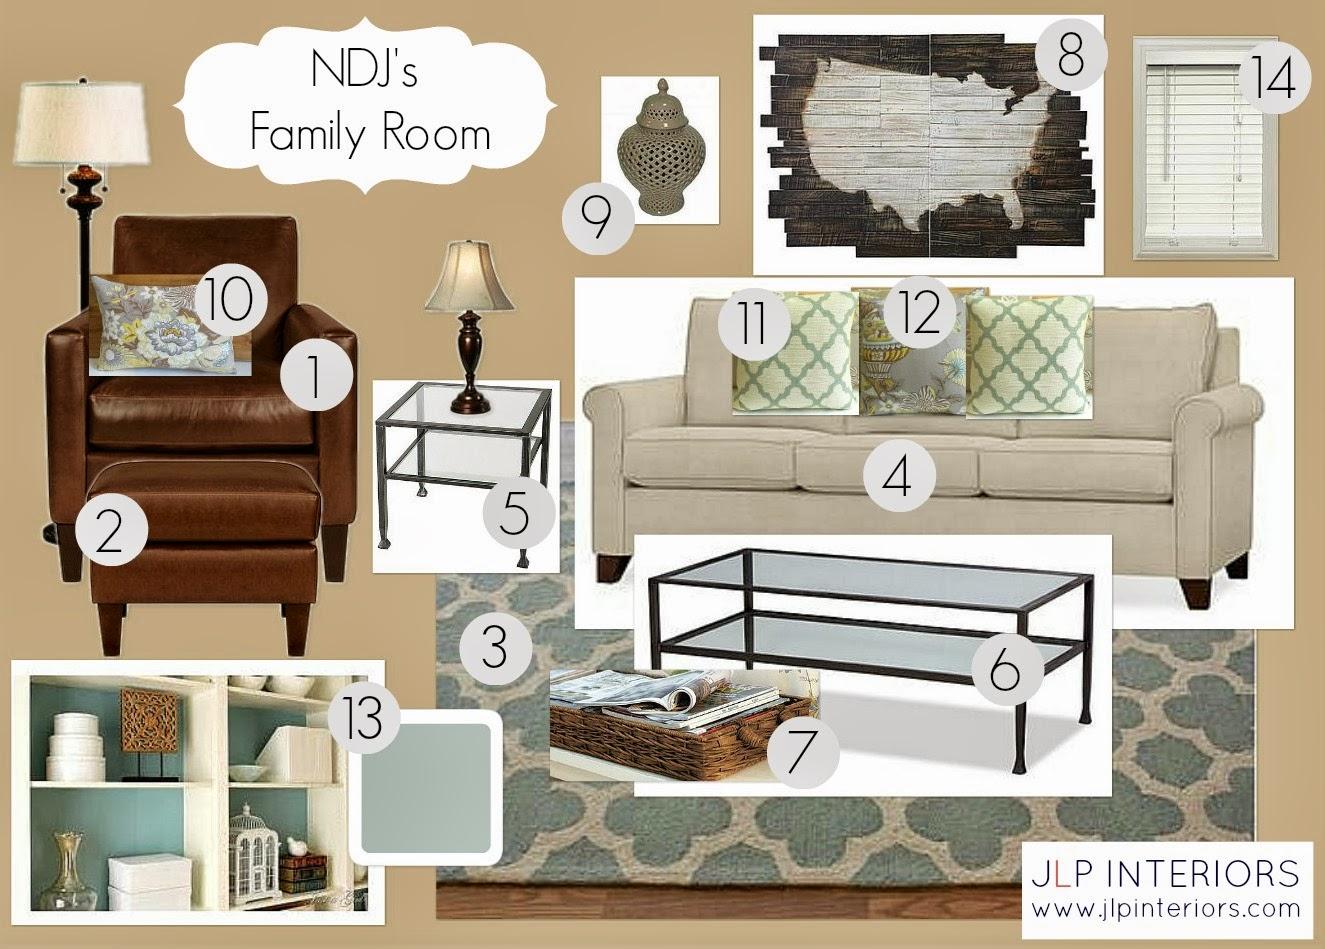 Home with baxter e design ndj 39 s family room design for Room design mood board